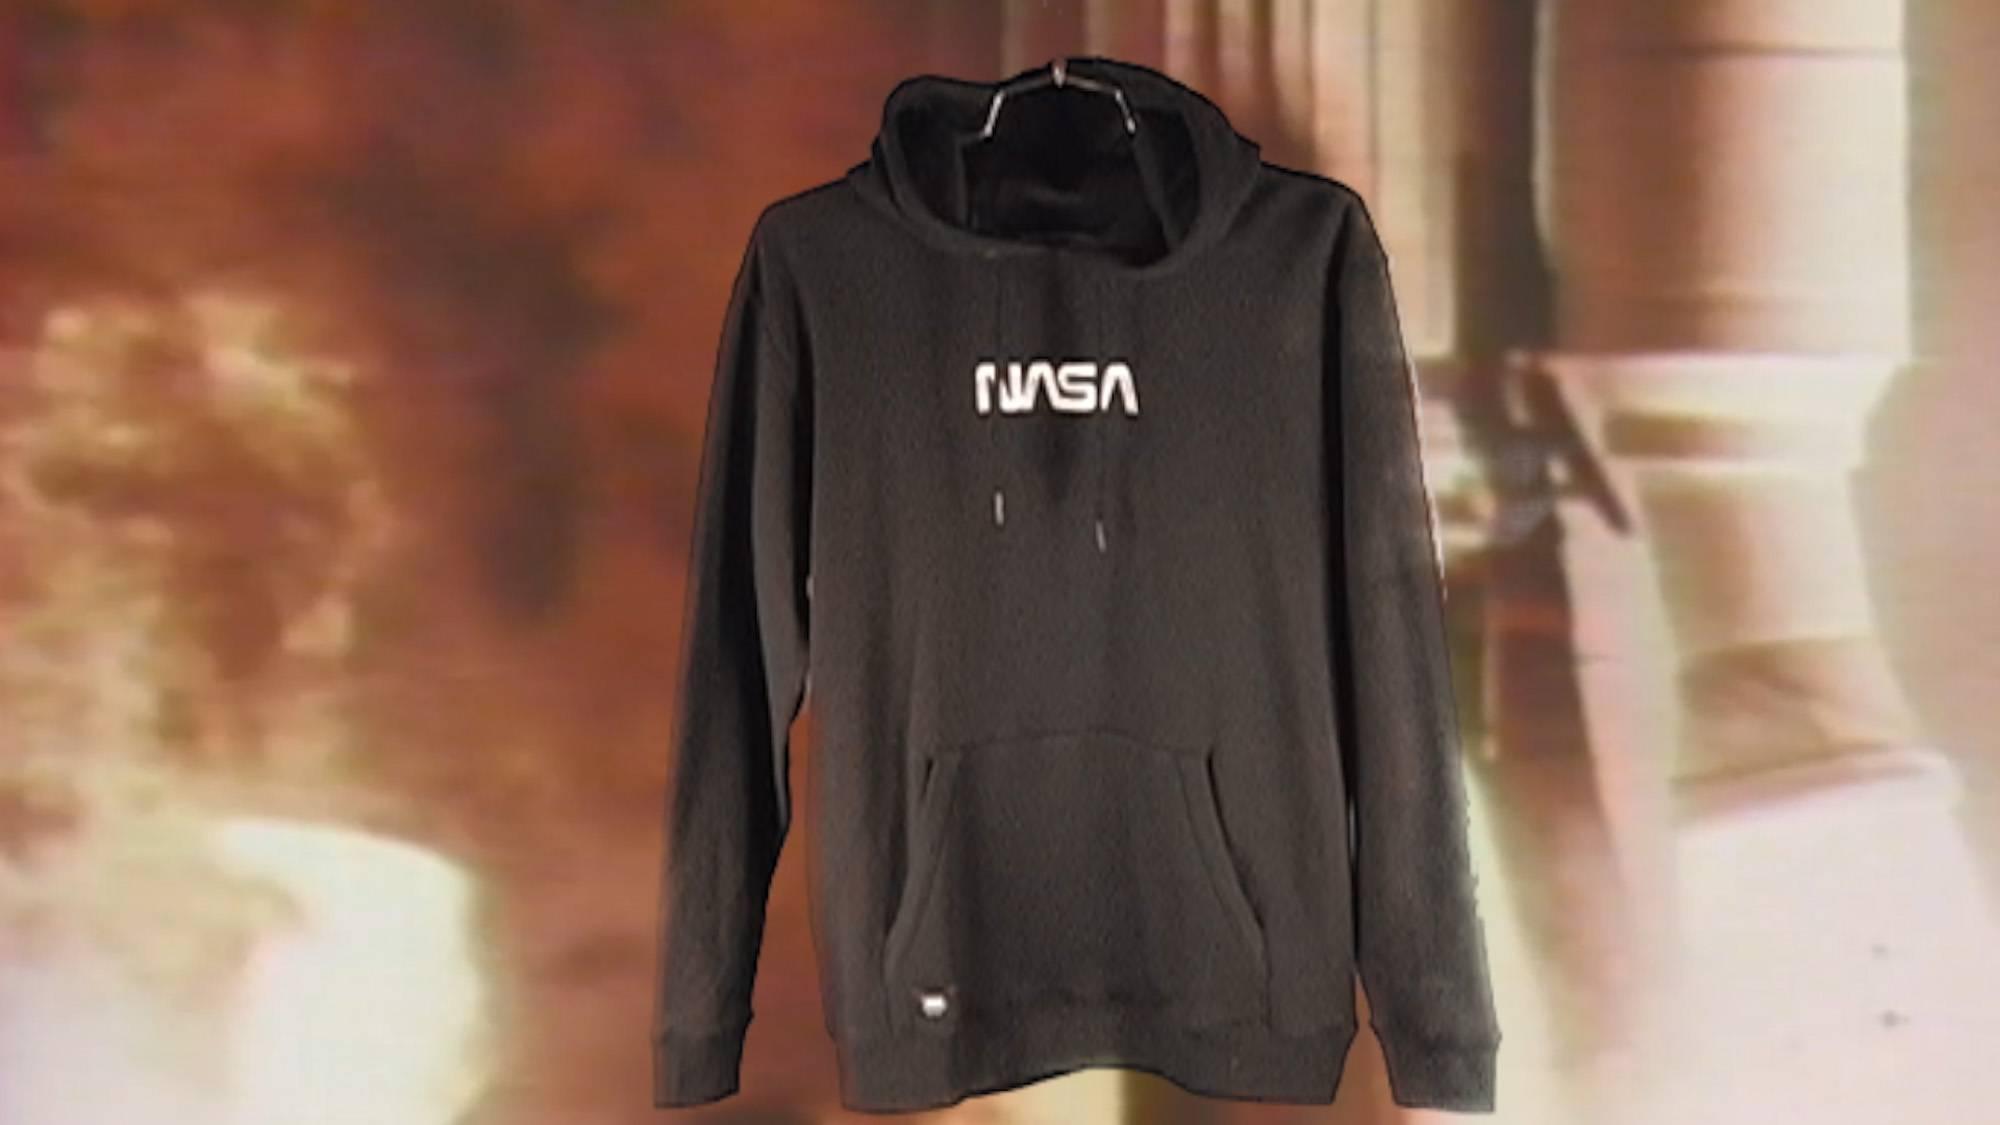 091f031c Vans Space Voyager x Nasa - презентация новой коллекции Ванс и Наса ...